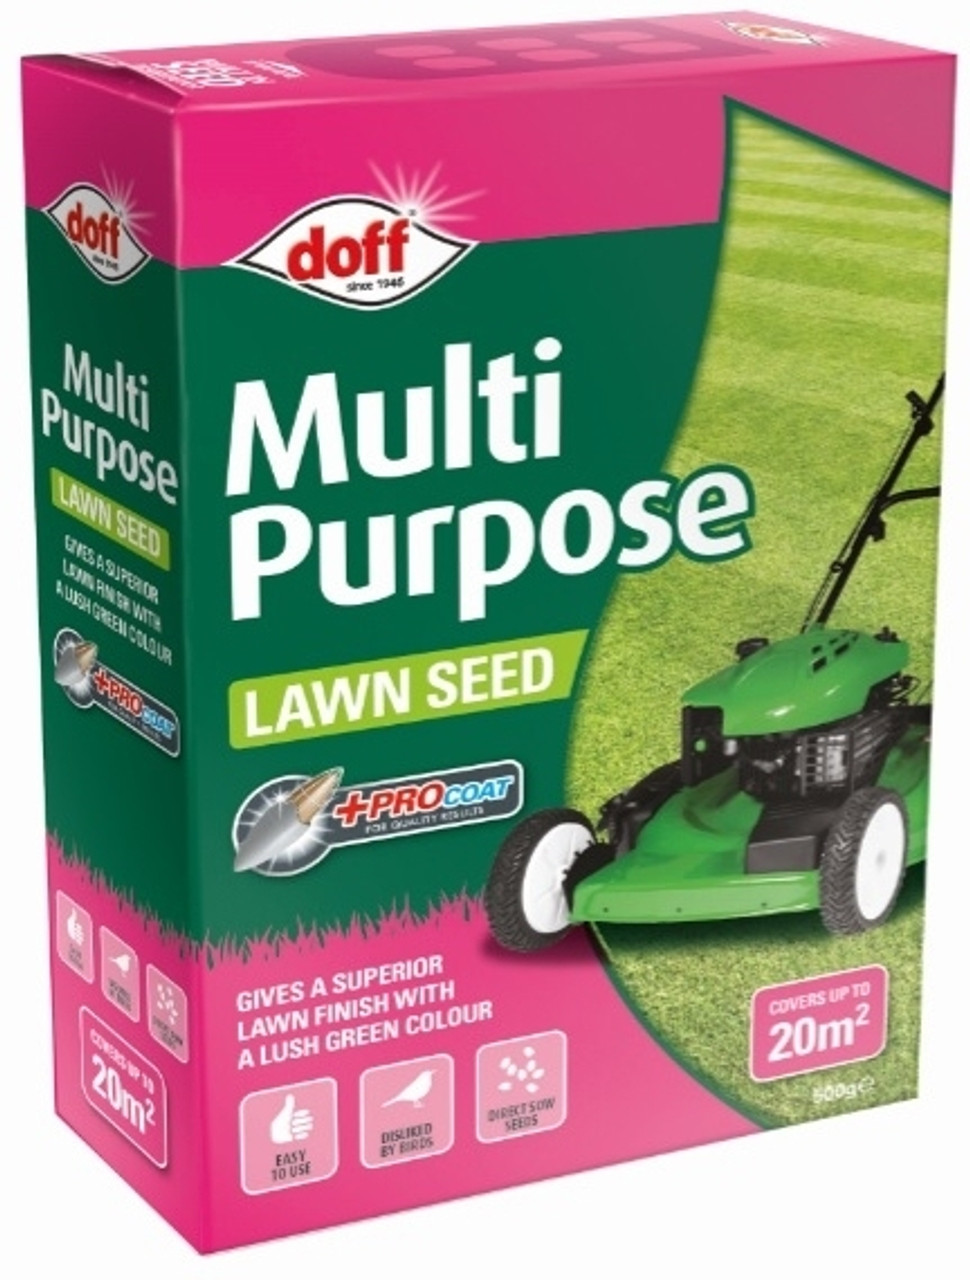 Doff 500g Multi-Purpose Grass Seed